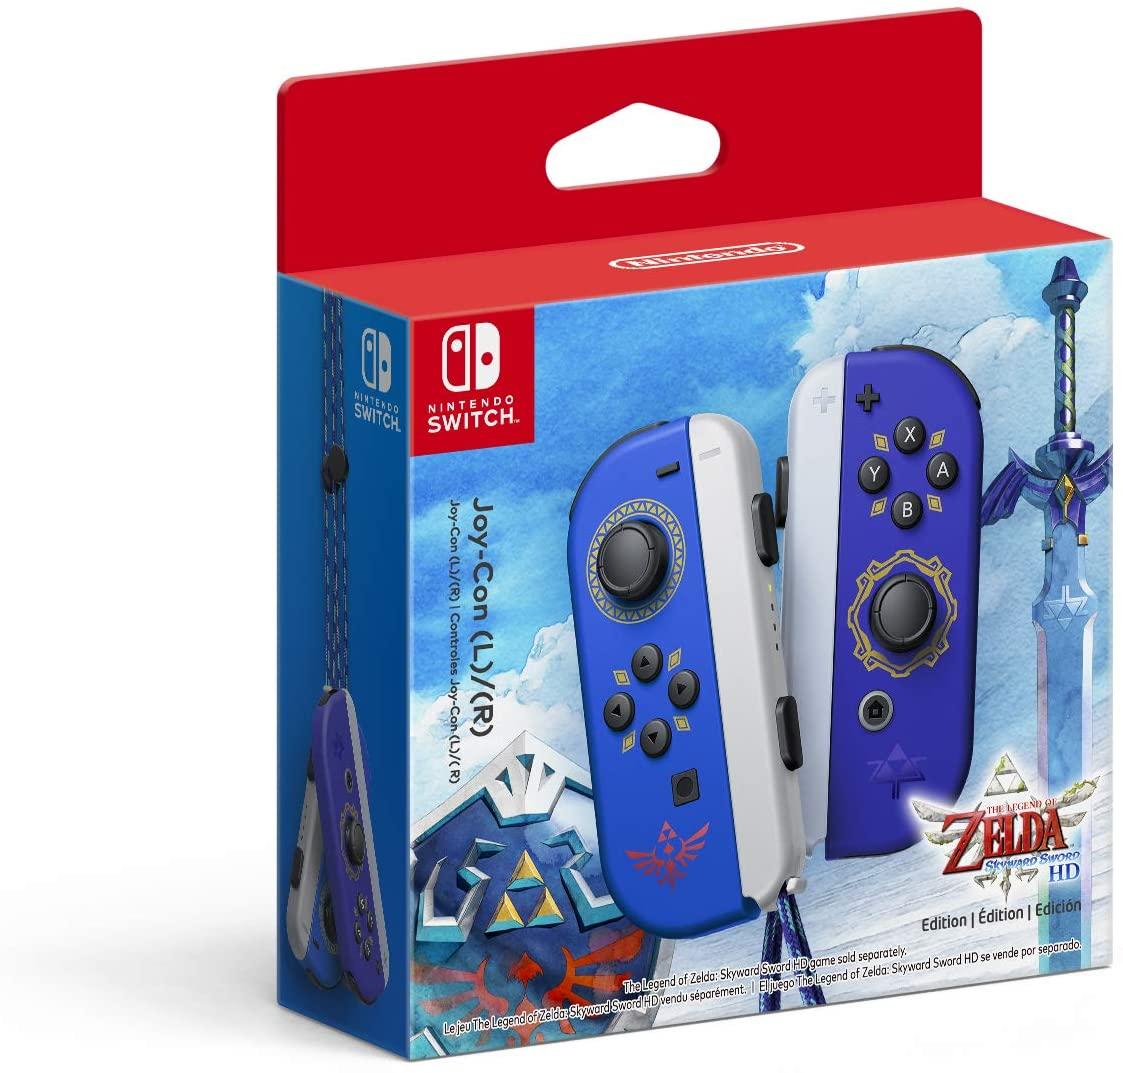 Joy-Con de The Legend of Zelda: Skyward Sword